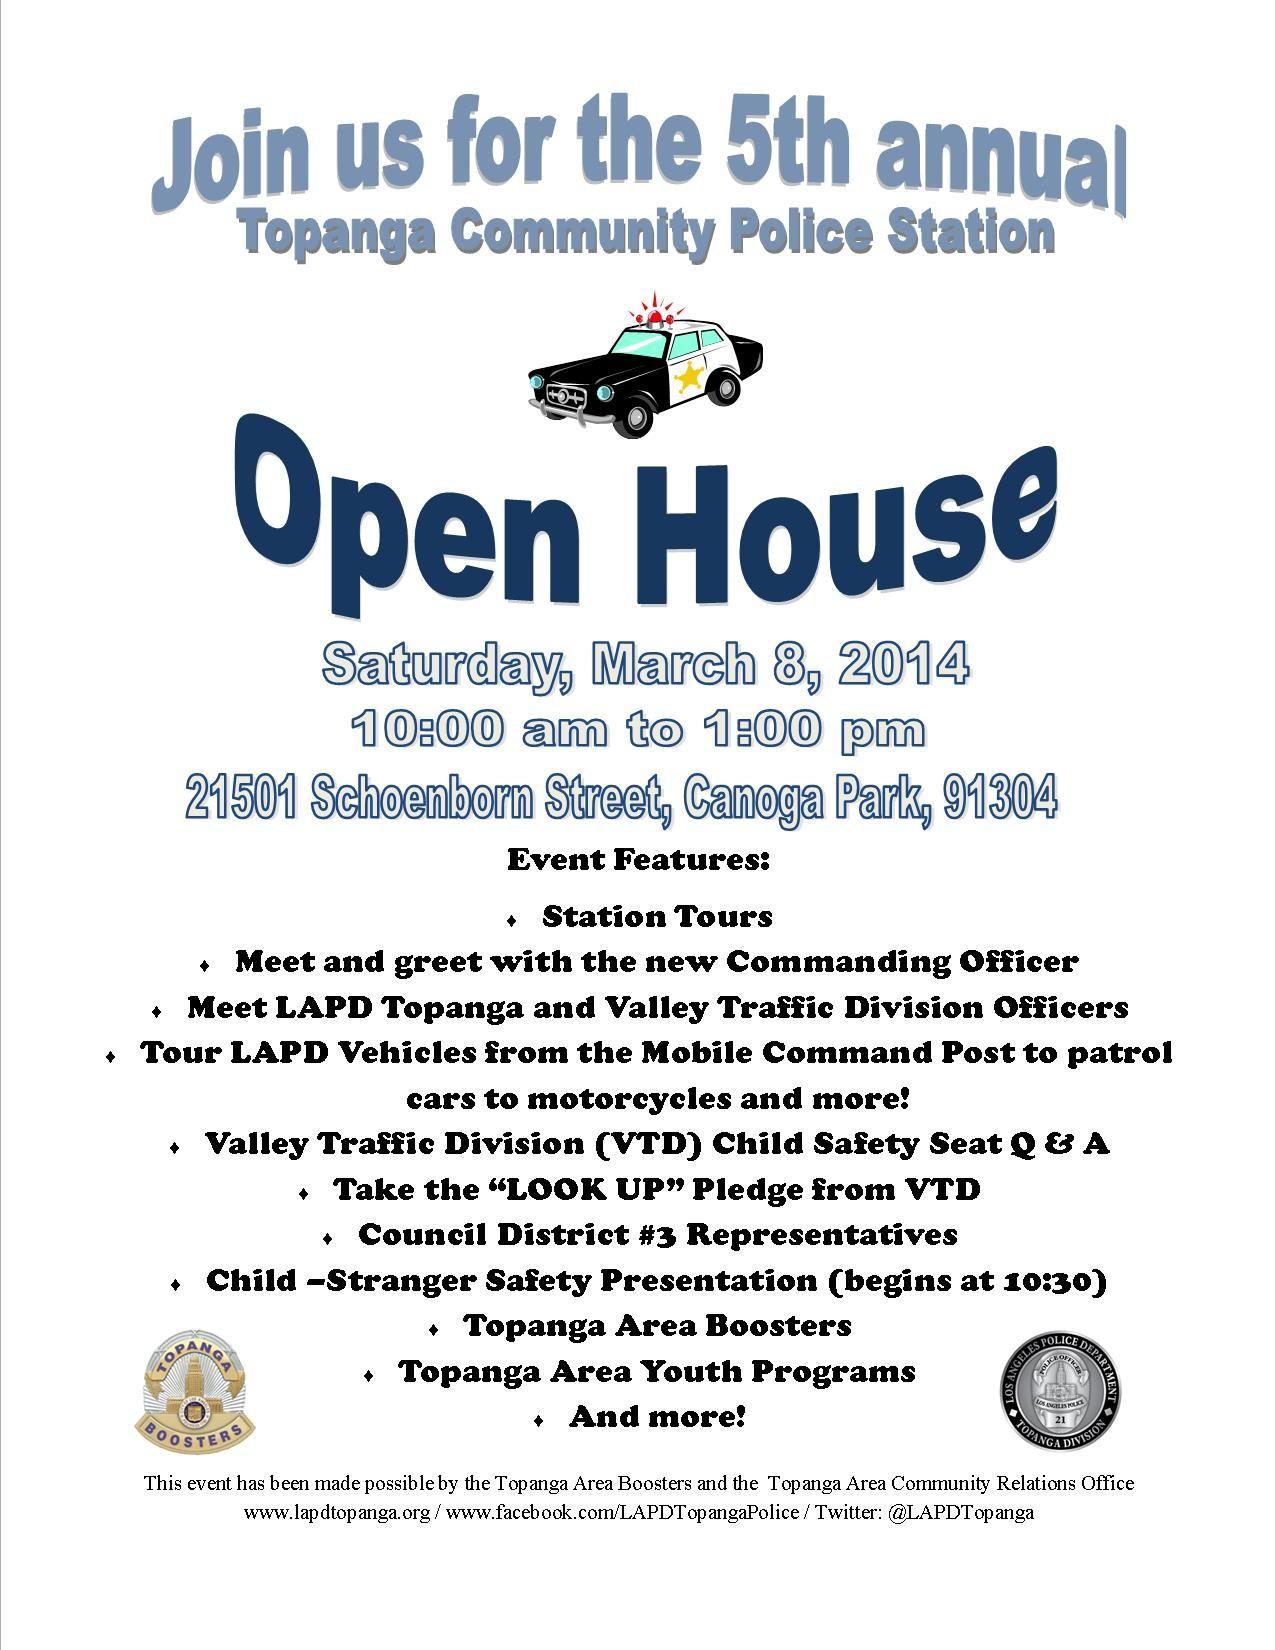 openhouse Topanga Community Police Station  SAT, Mar 8, 10AM